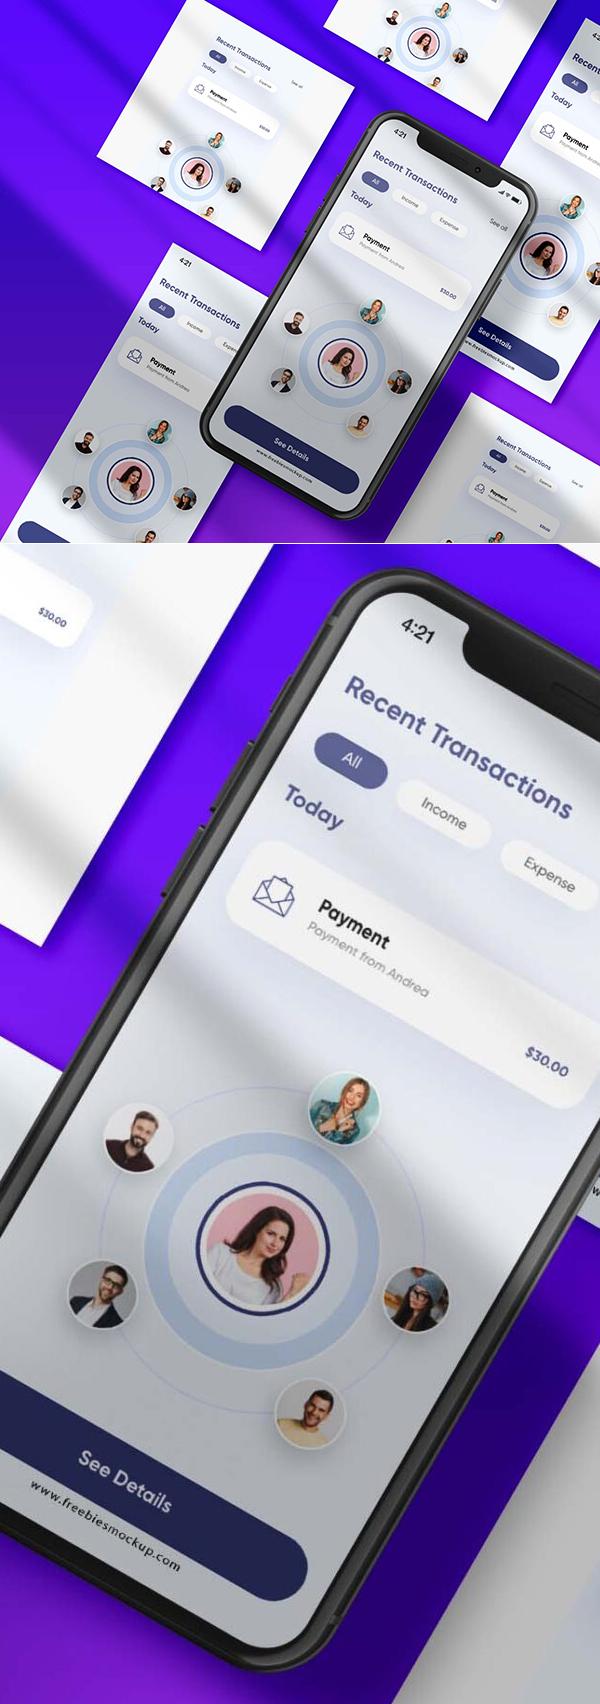 Free Mobile Application Presentation Mockup